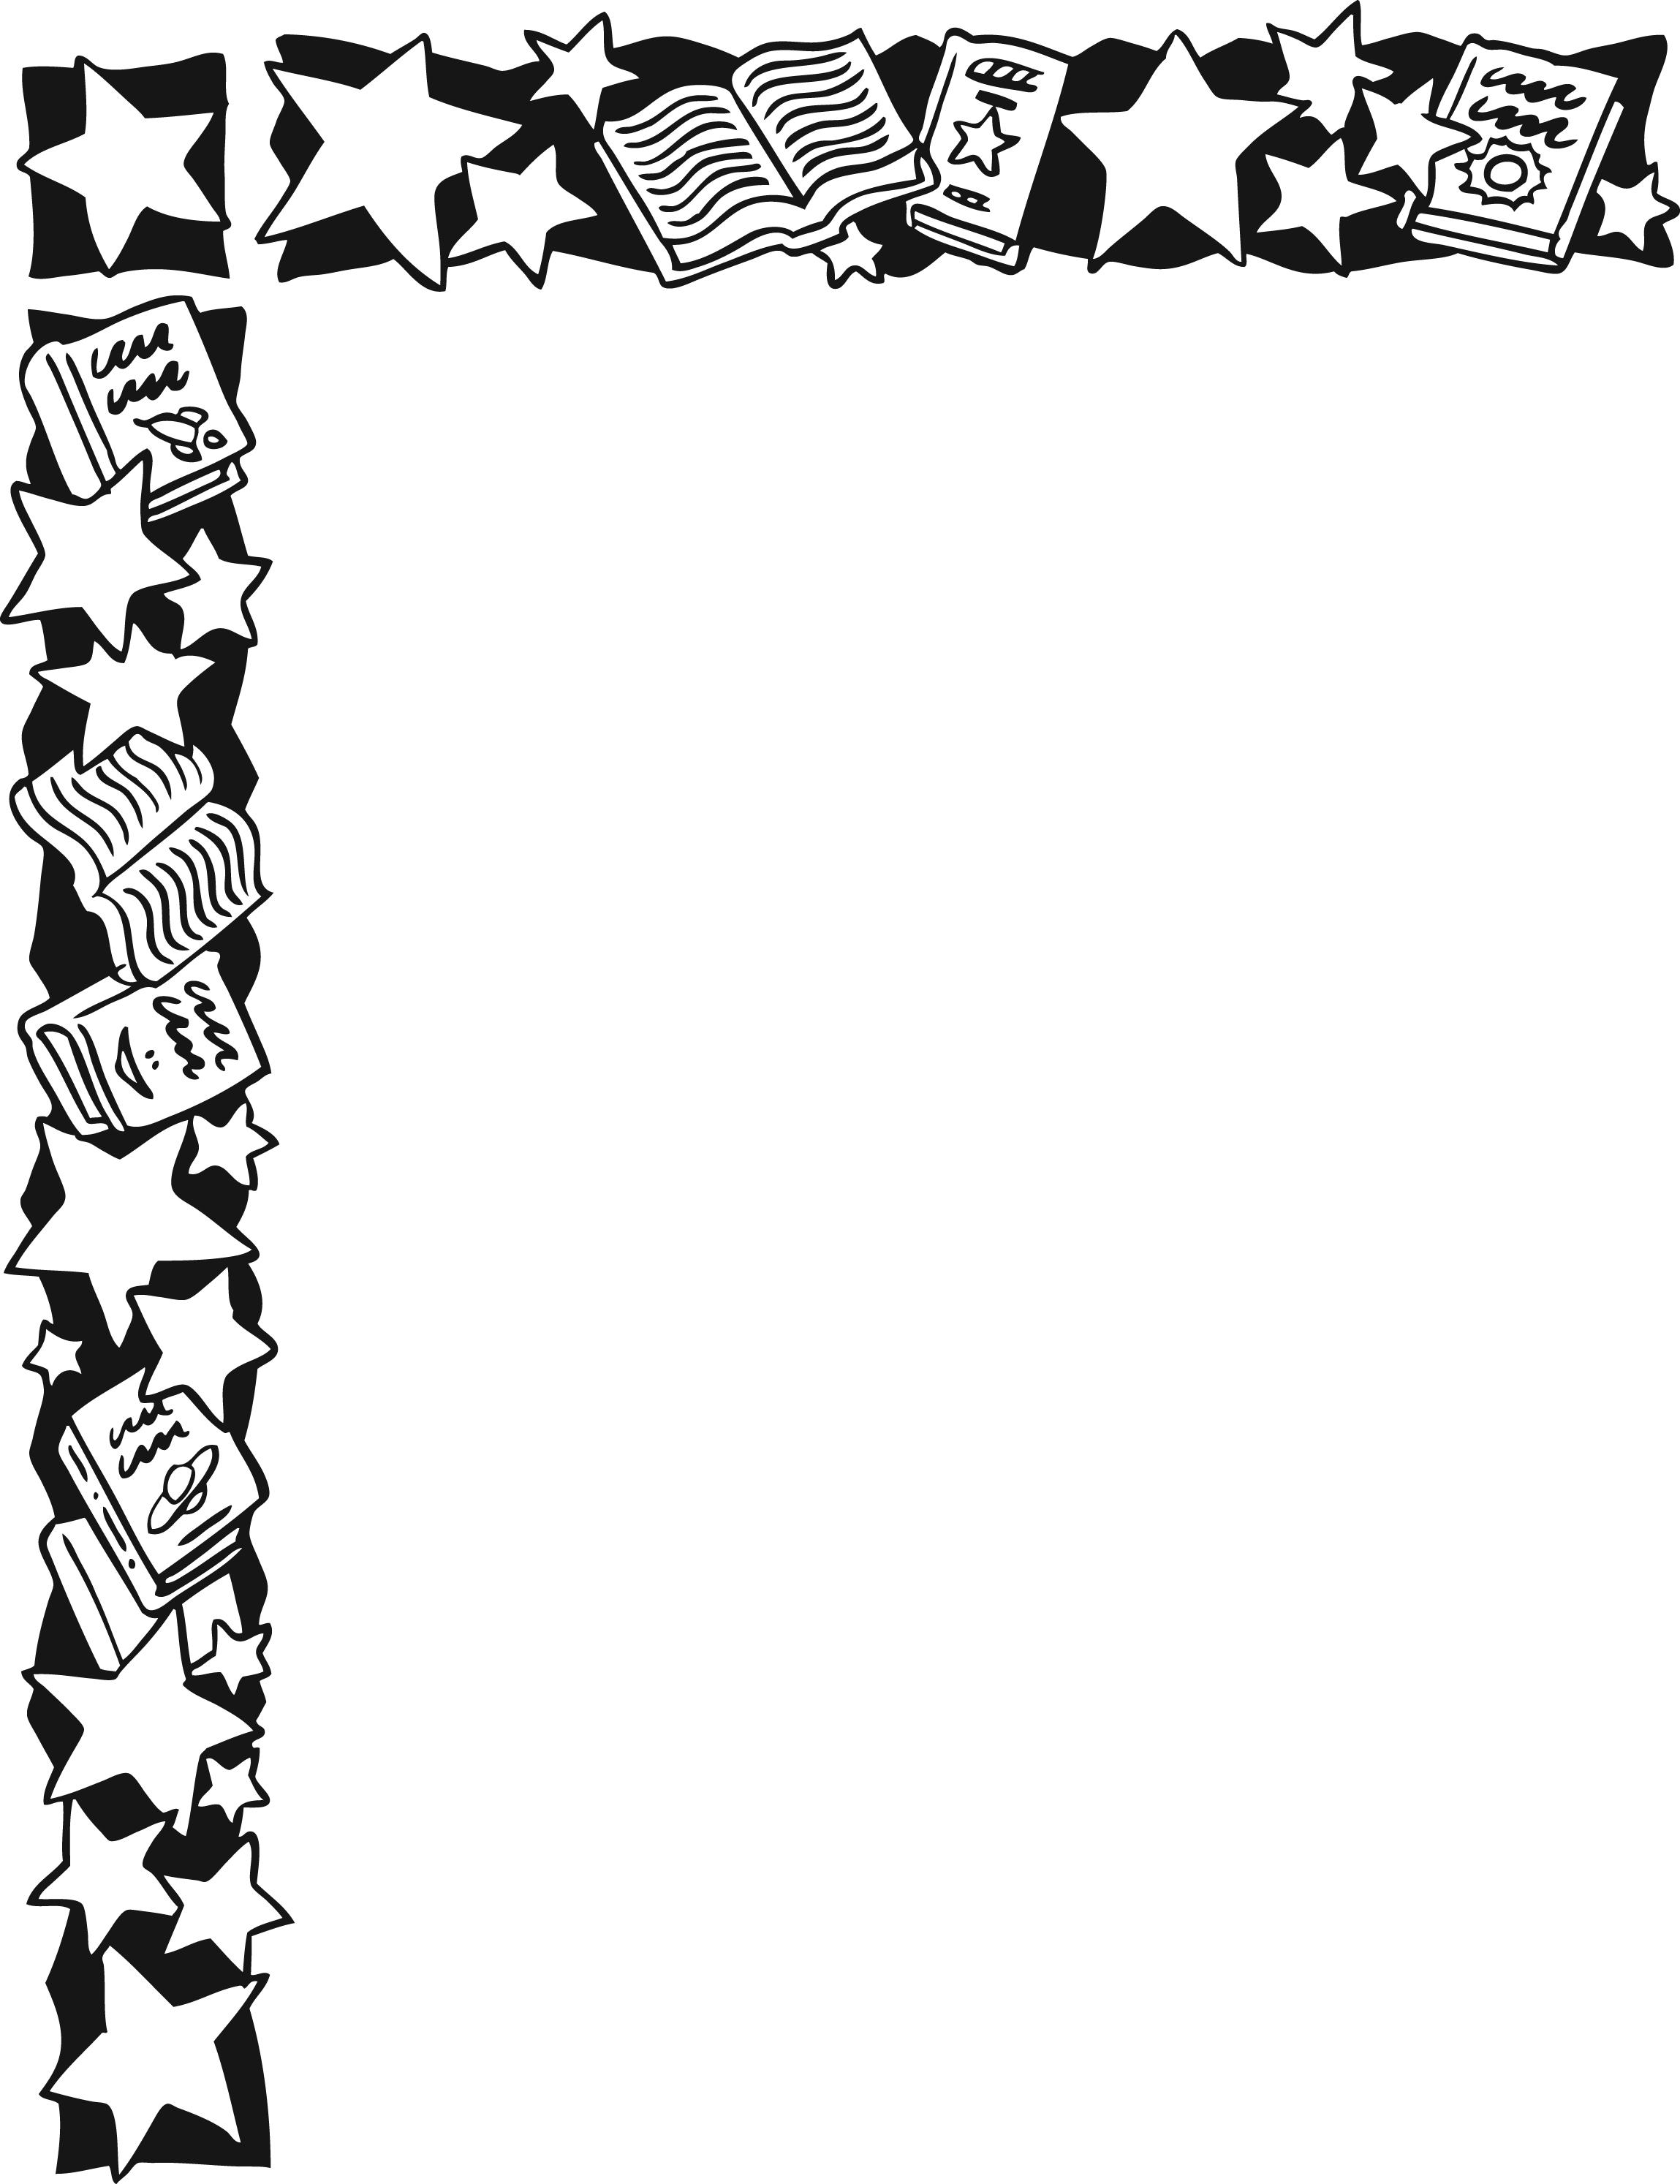 Patriotic star border clipart black and white banner black and white Free Star Border, Download Free Clip Art, Free Clip Art on ... banner black and white